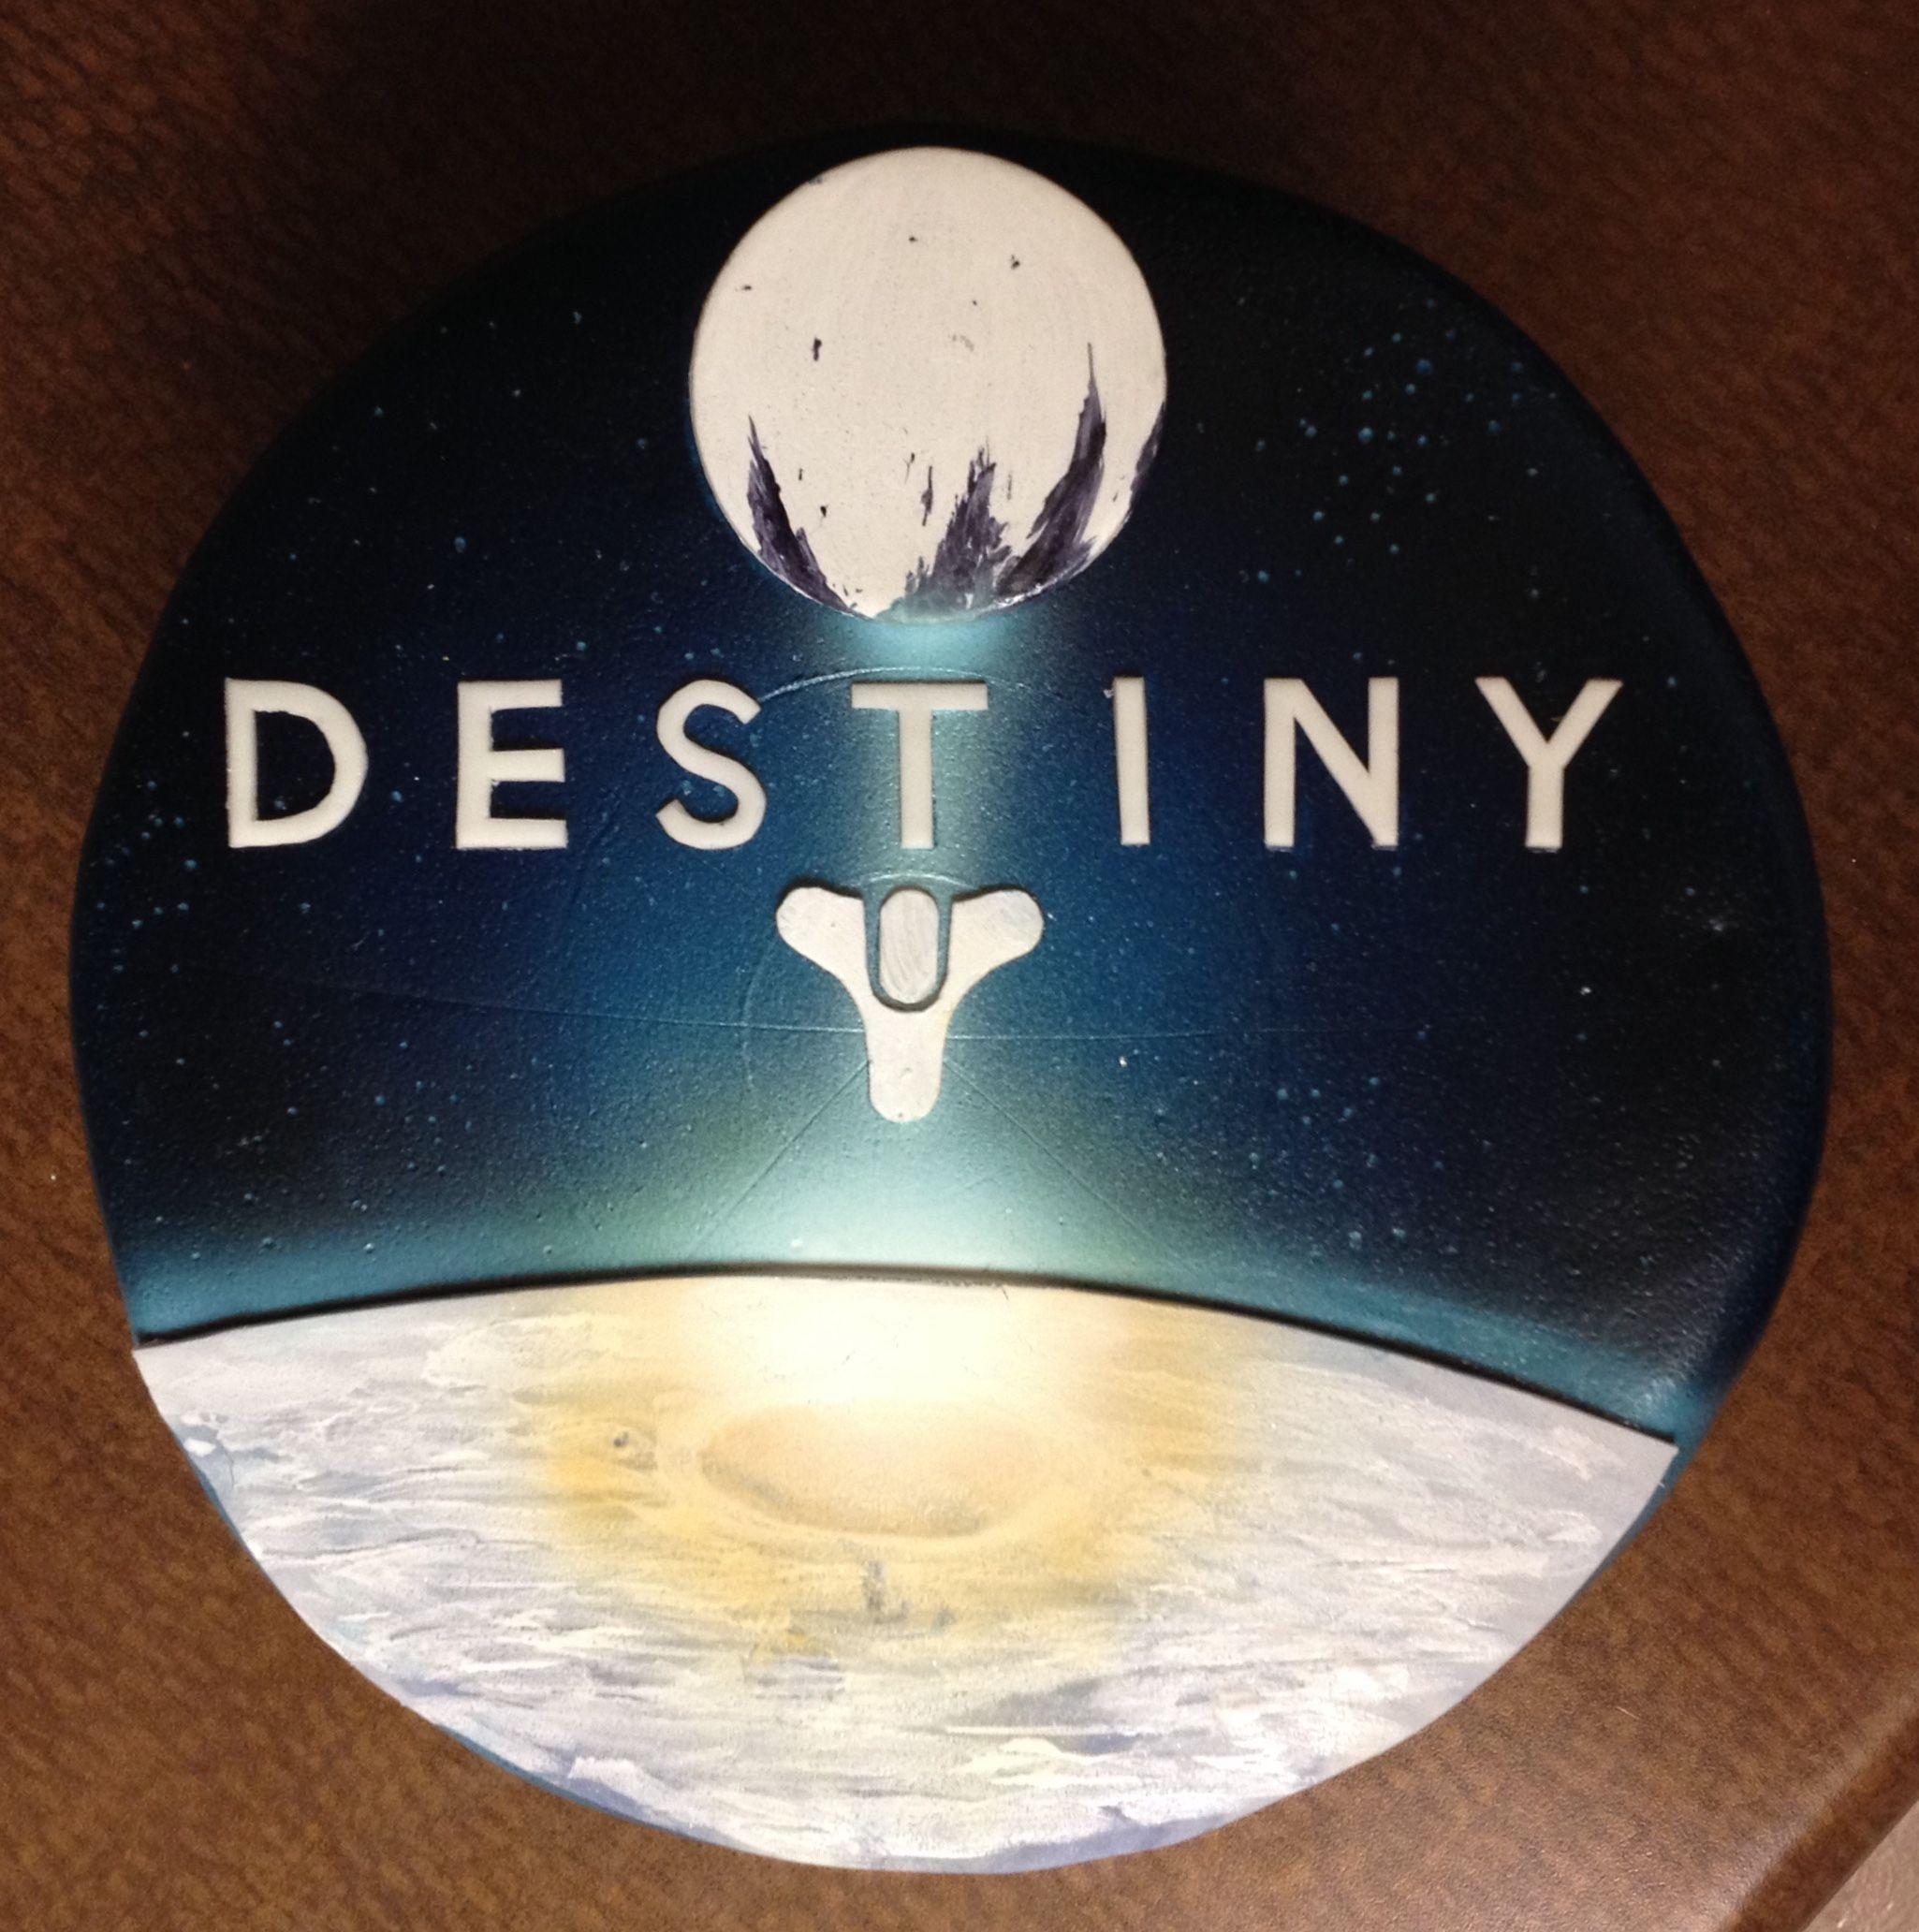 Destiny video game birthday cake Whimsy Cakes Pinterest